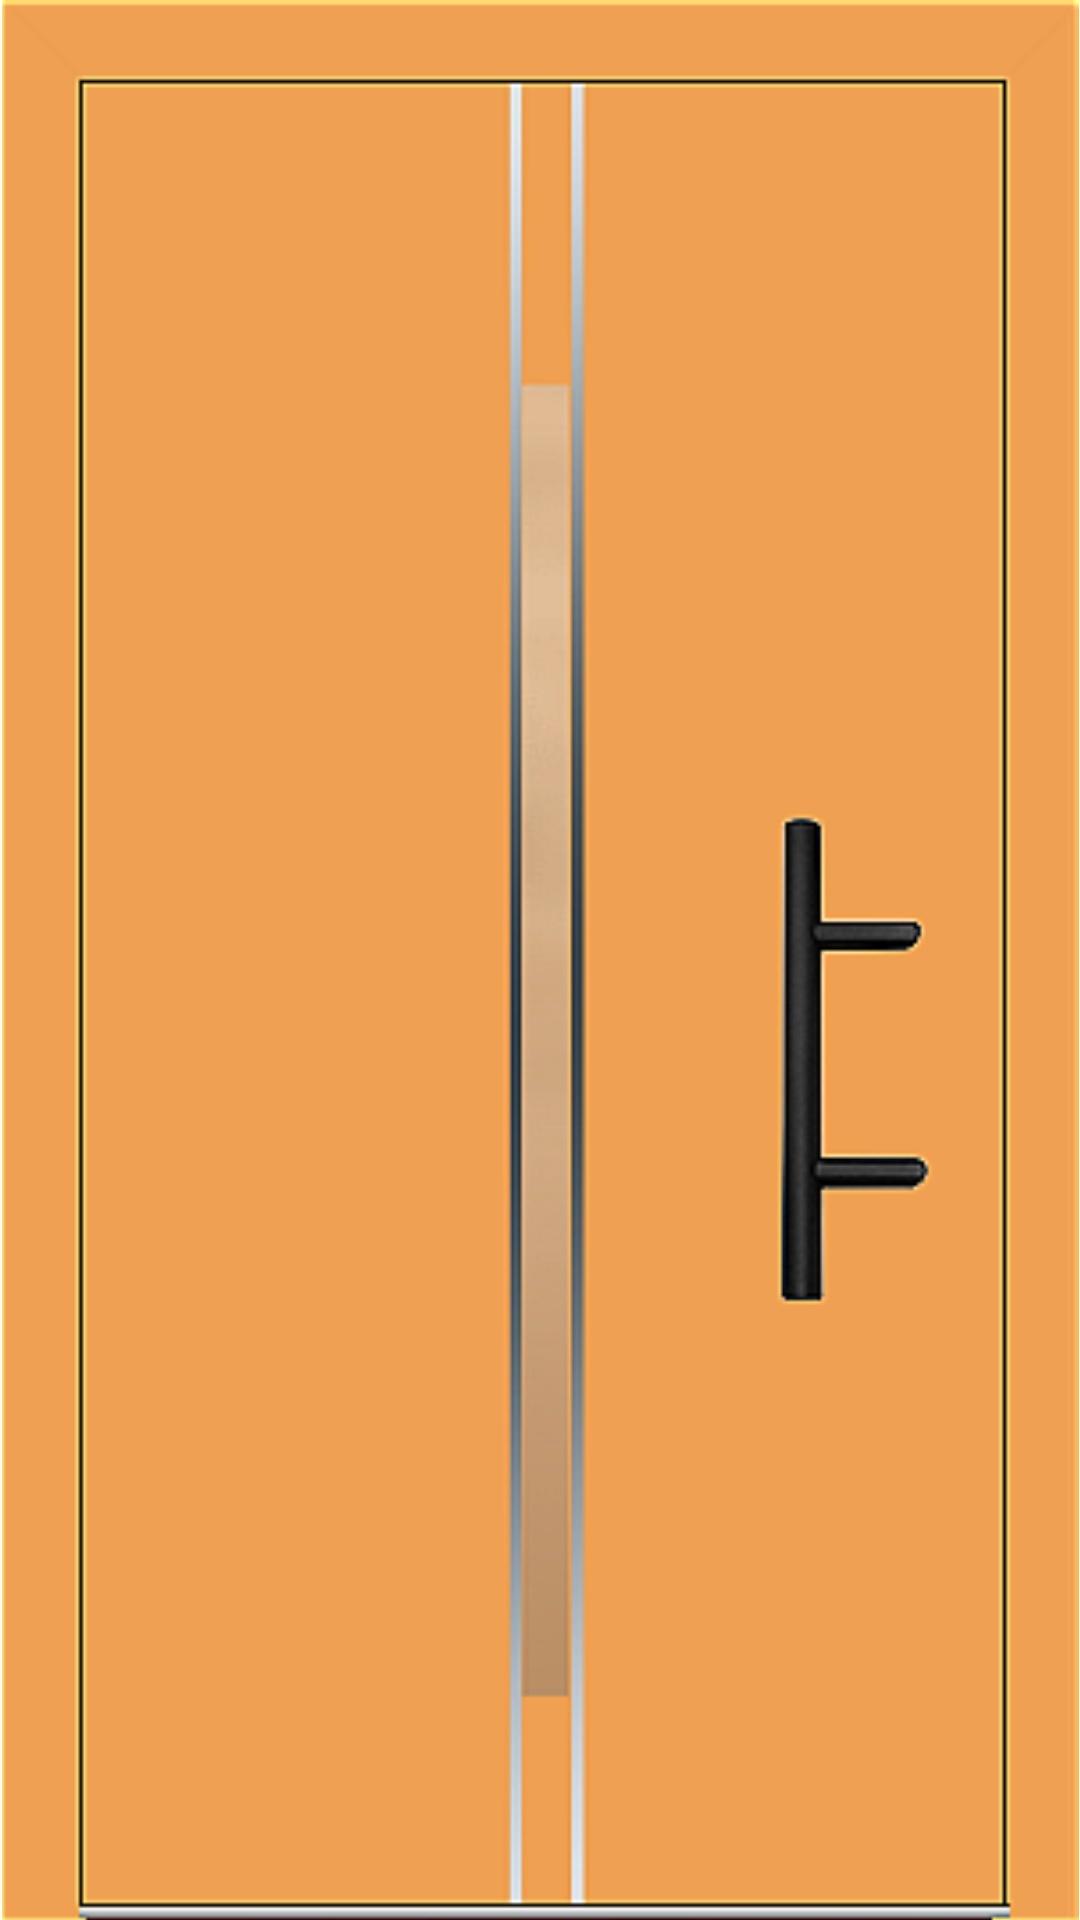 Holz-Alu Haustür Modell 66864 safrangelb